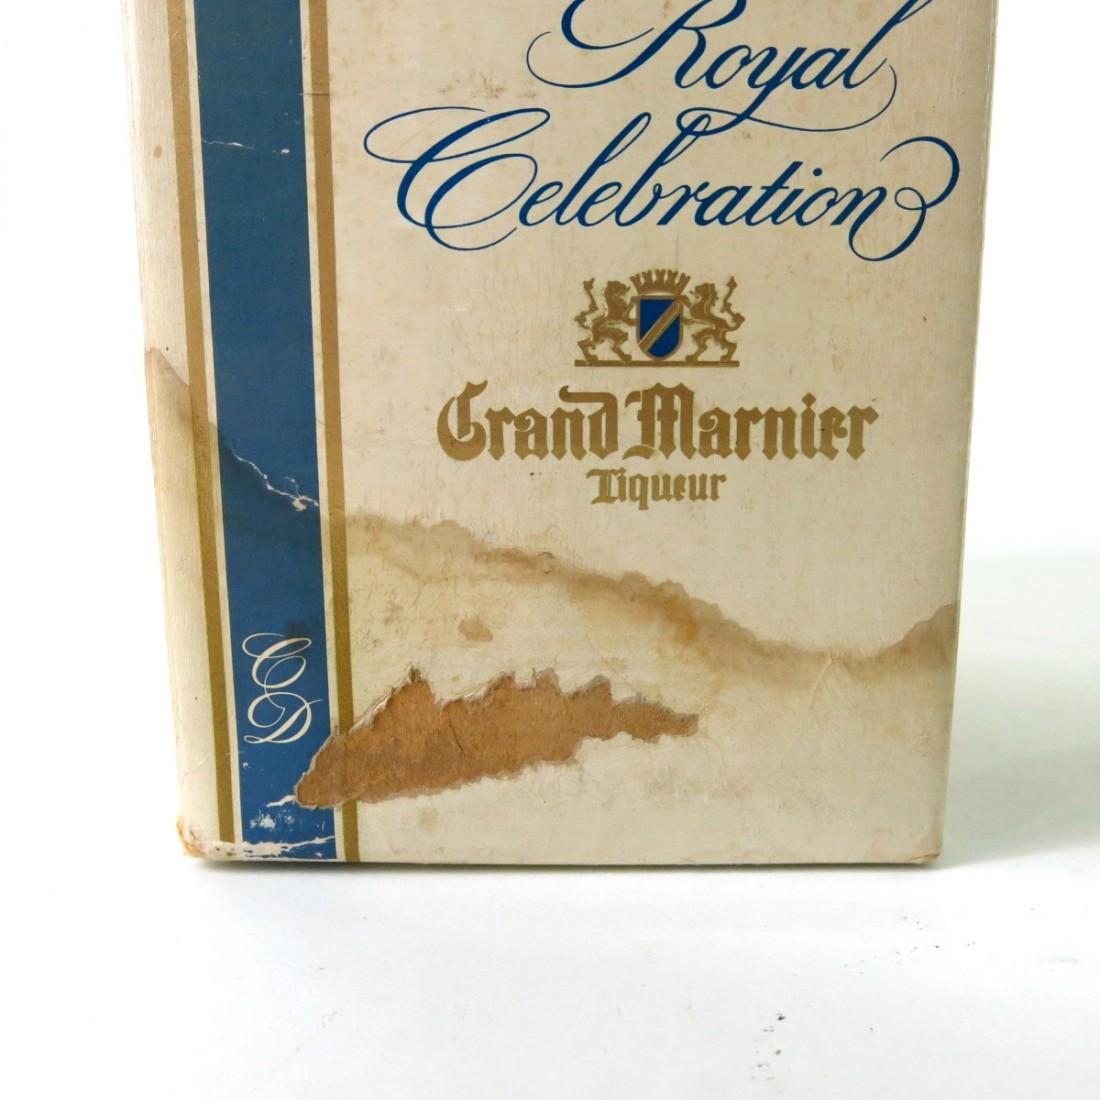 Grand Marnier Royal Celebration 1981